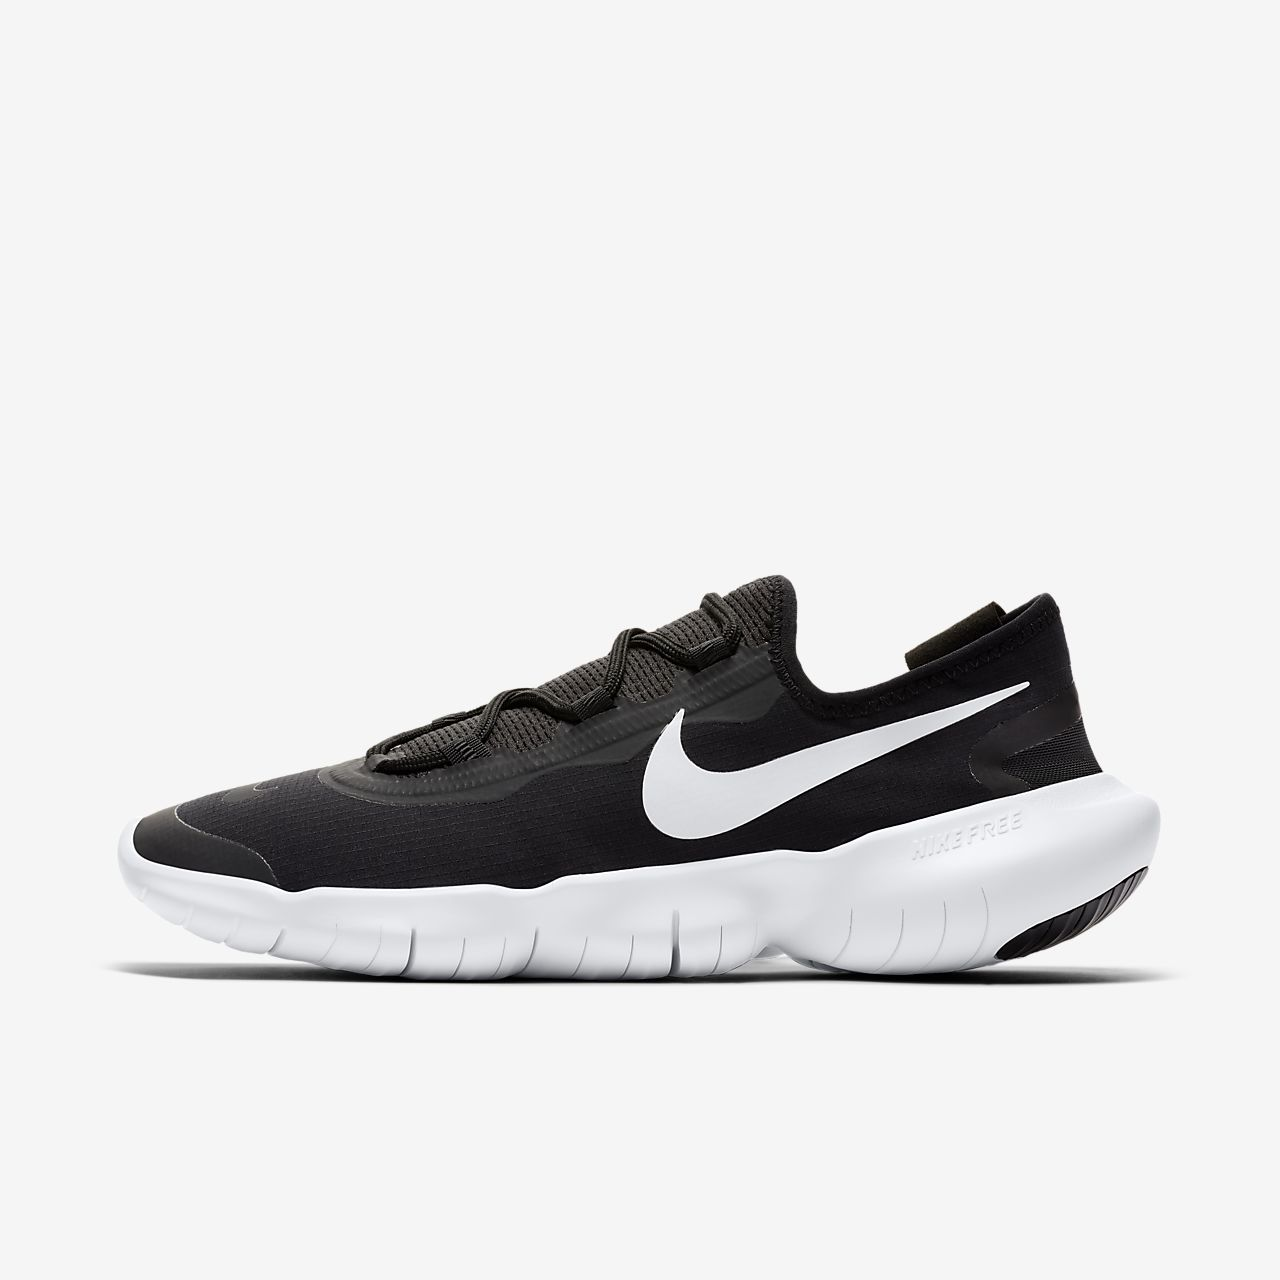 Nike Shoes on | Nike free shoes, Running shoes nike, Nike